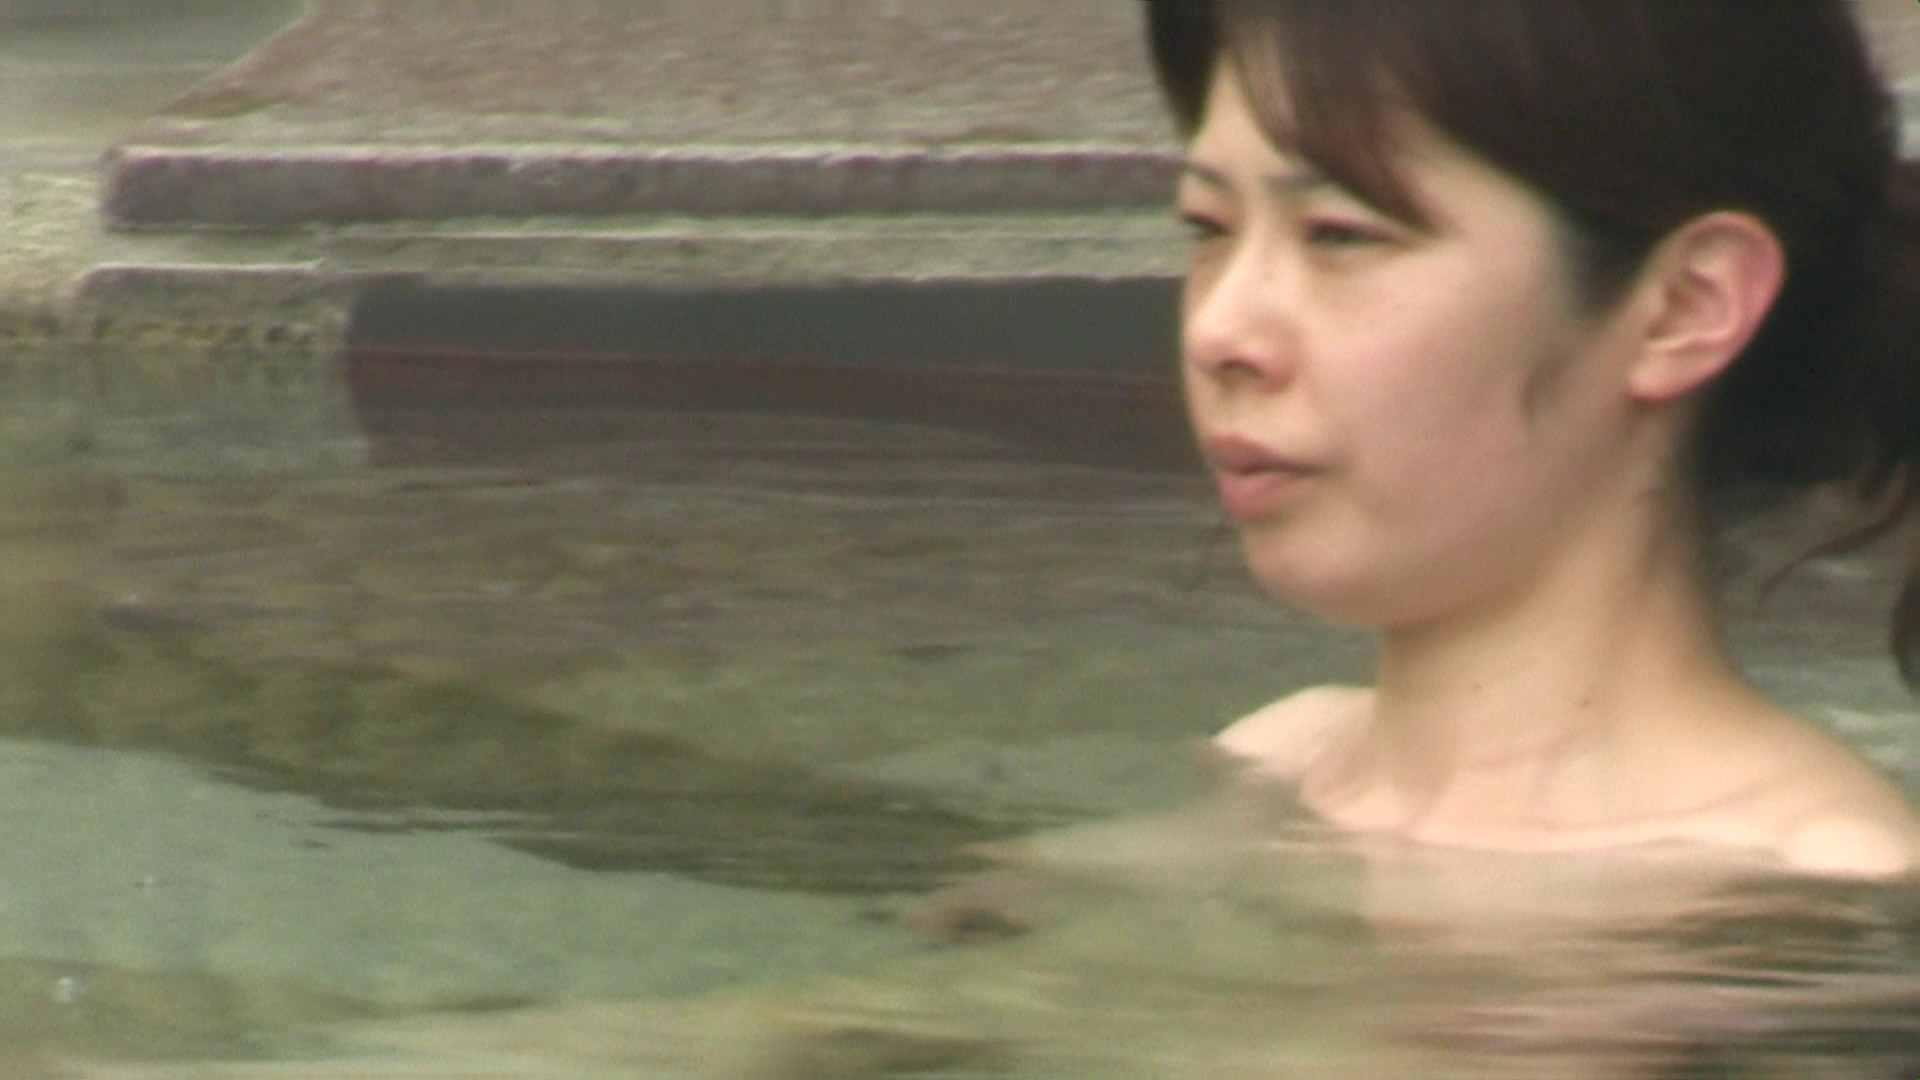 Aquaな露天風呂Vol.676 盗撮シリーズ | 露天風呂編  83PIX 11